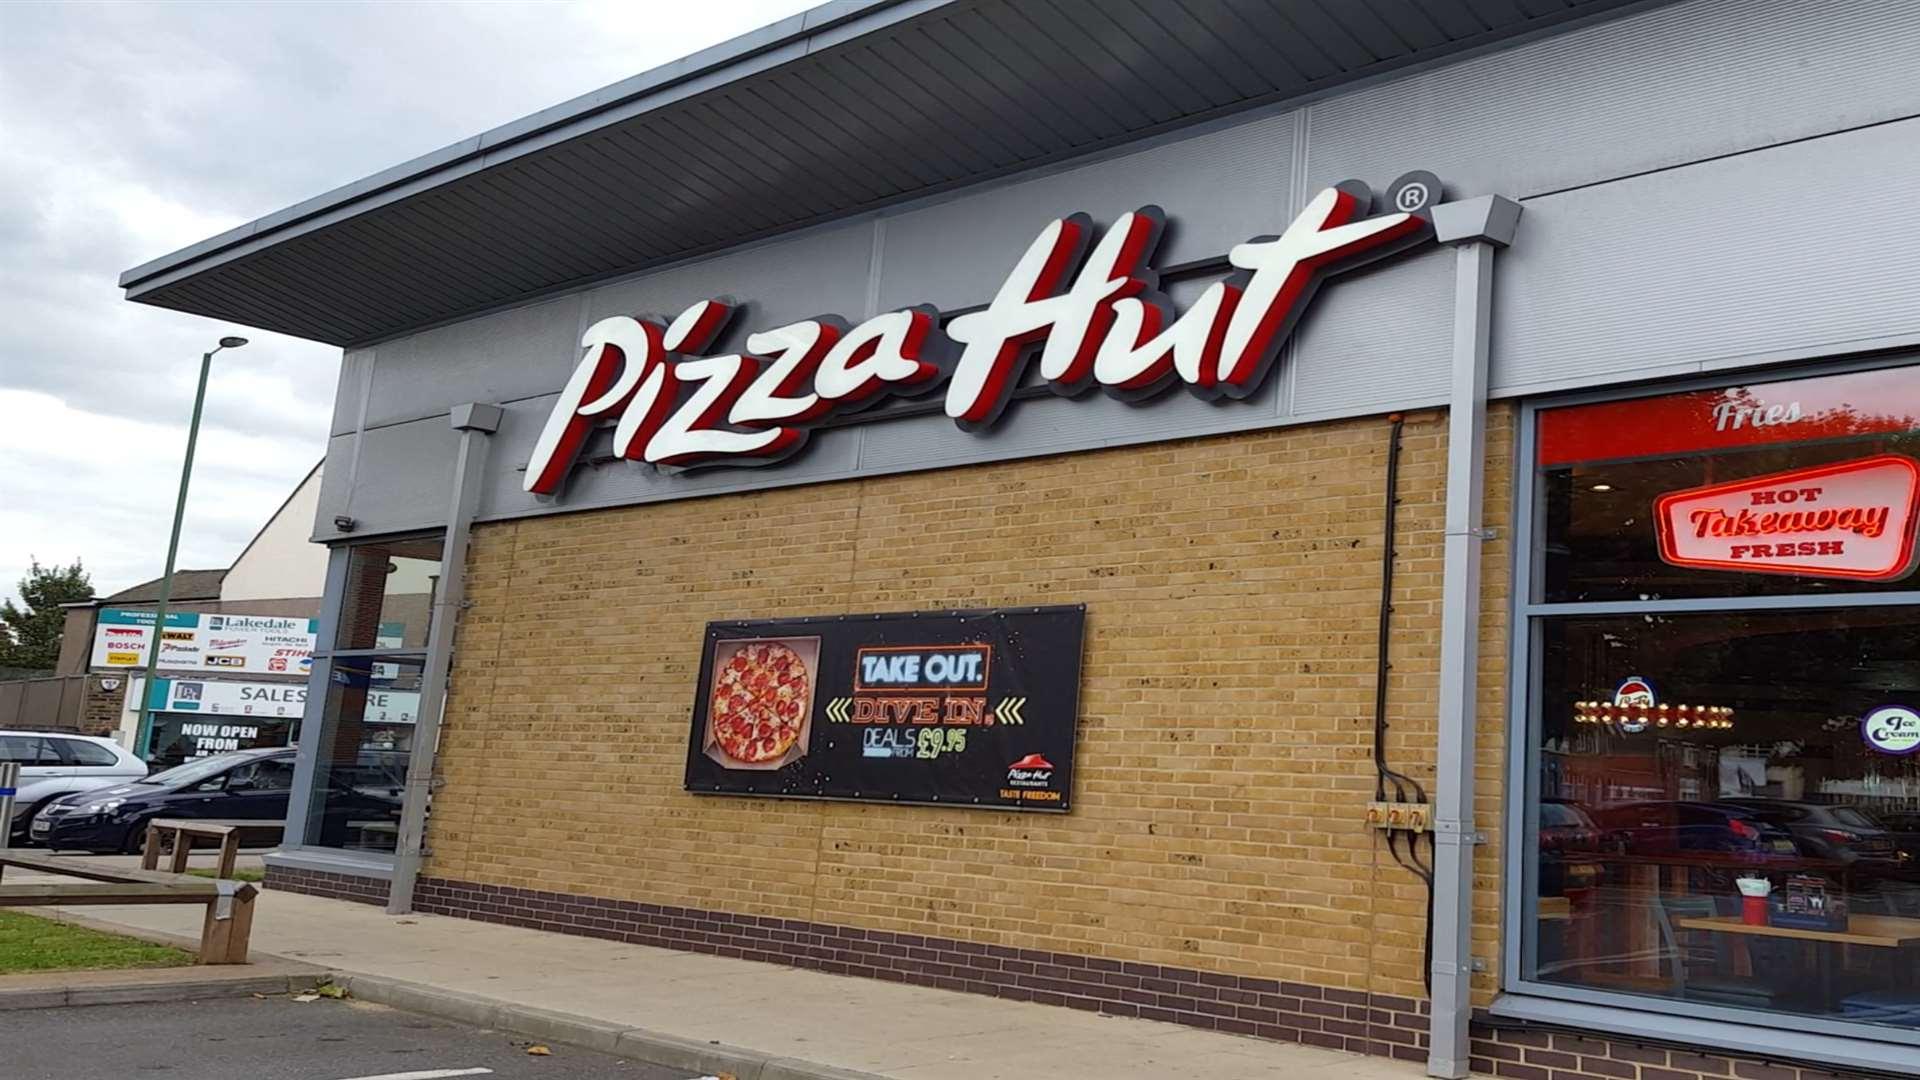 Police Officers Seen Cordoning Off Pizza Hut In Dartfords